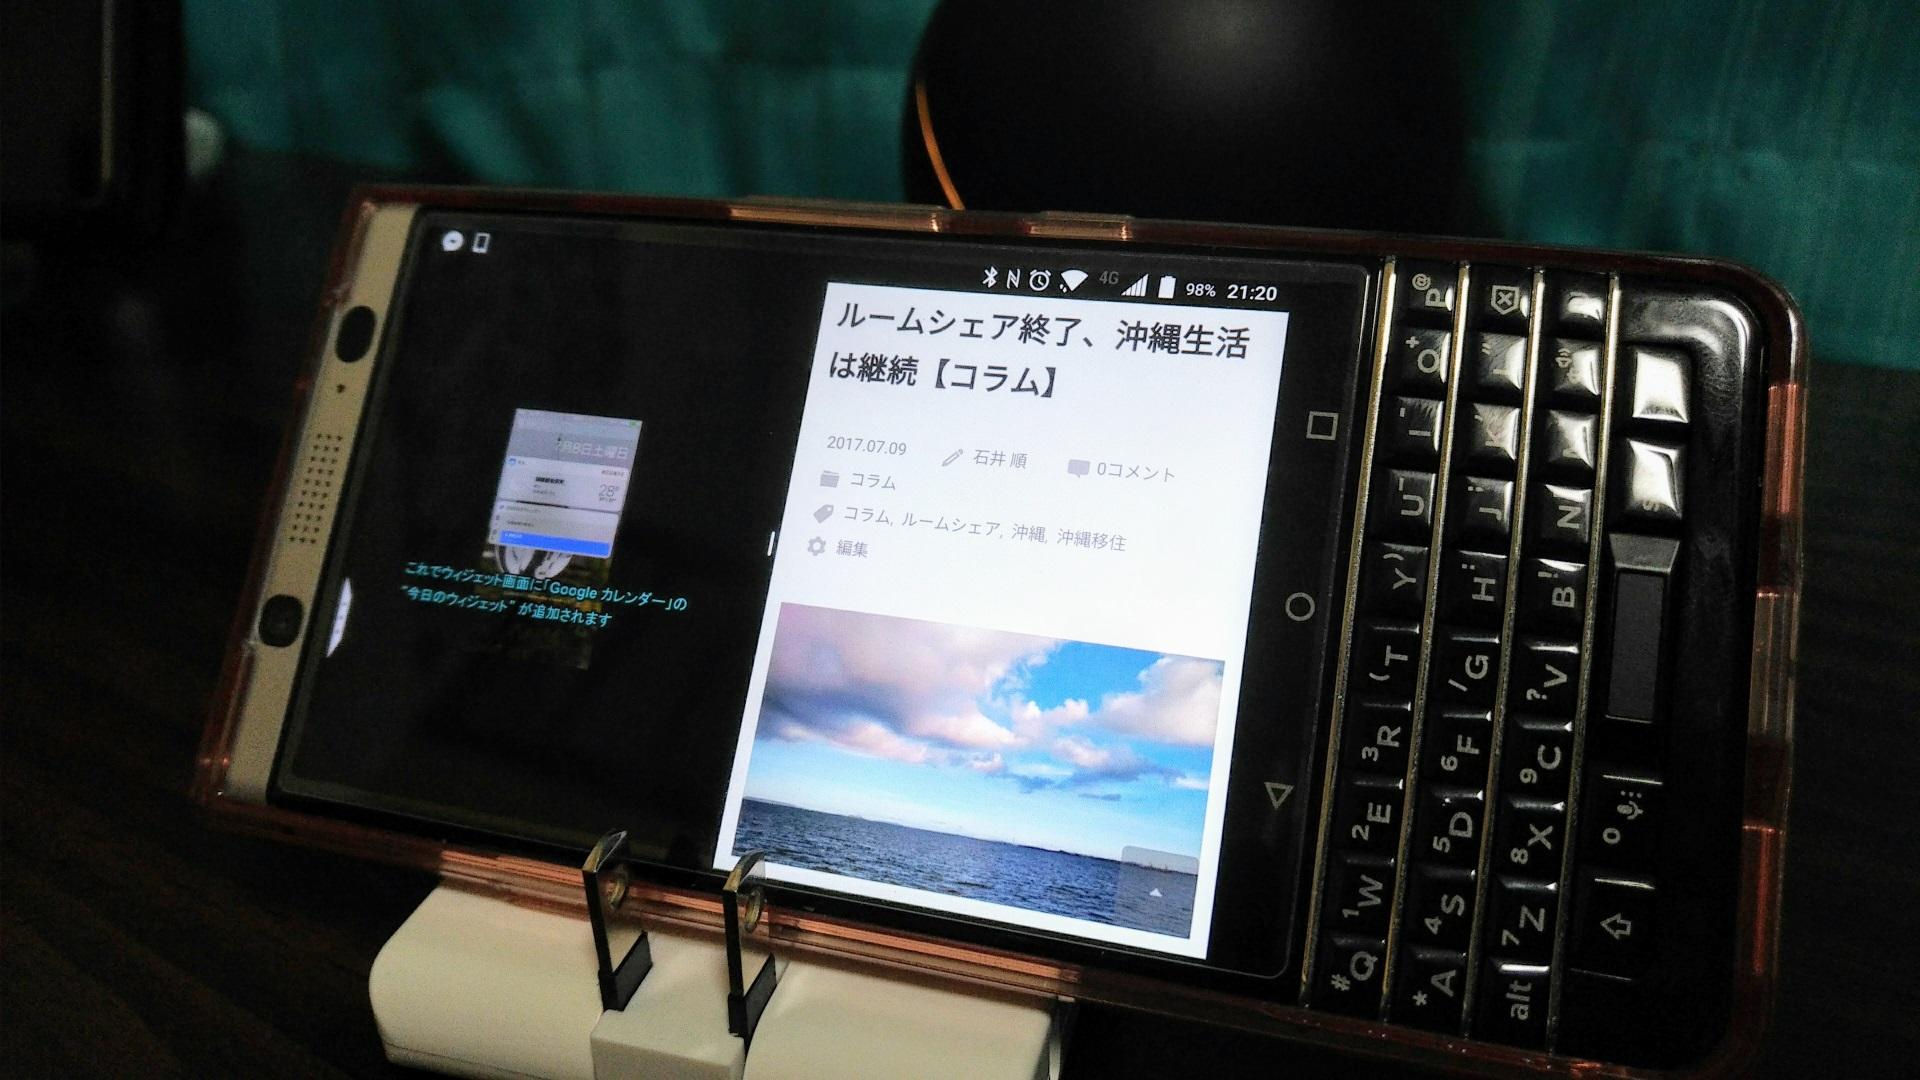 Android 7.0のマルチウィンドウももちろん利用可能【KEYone Tips】